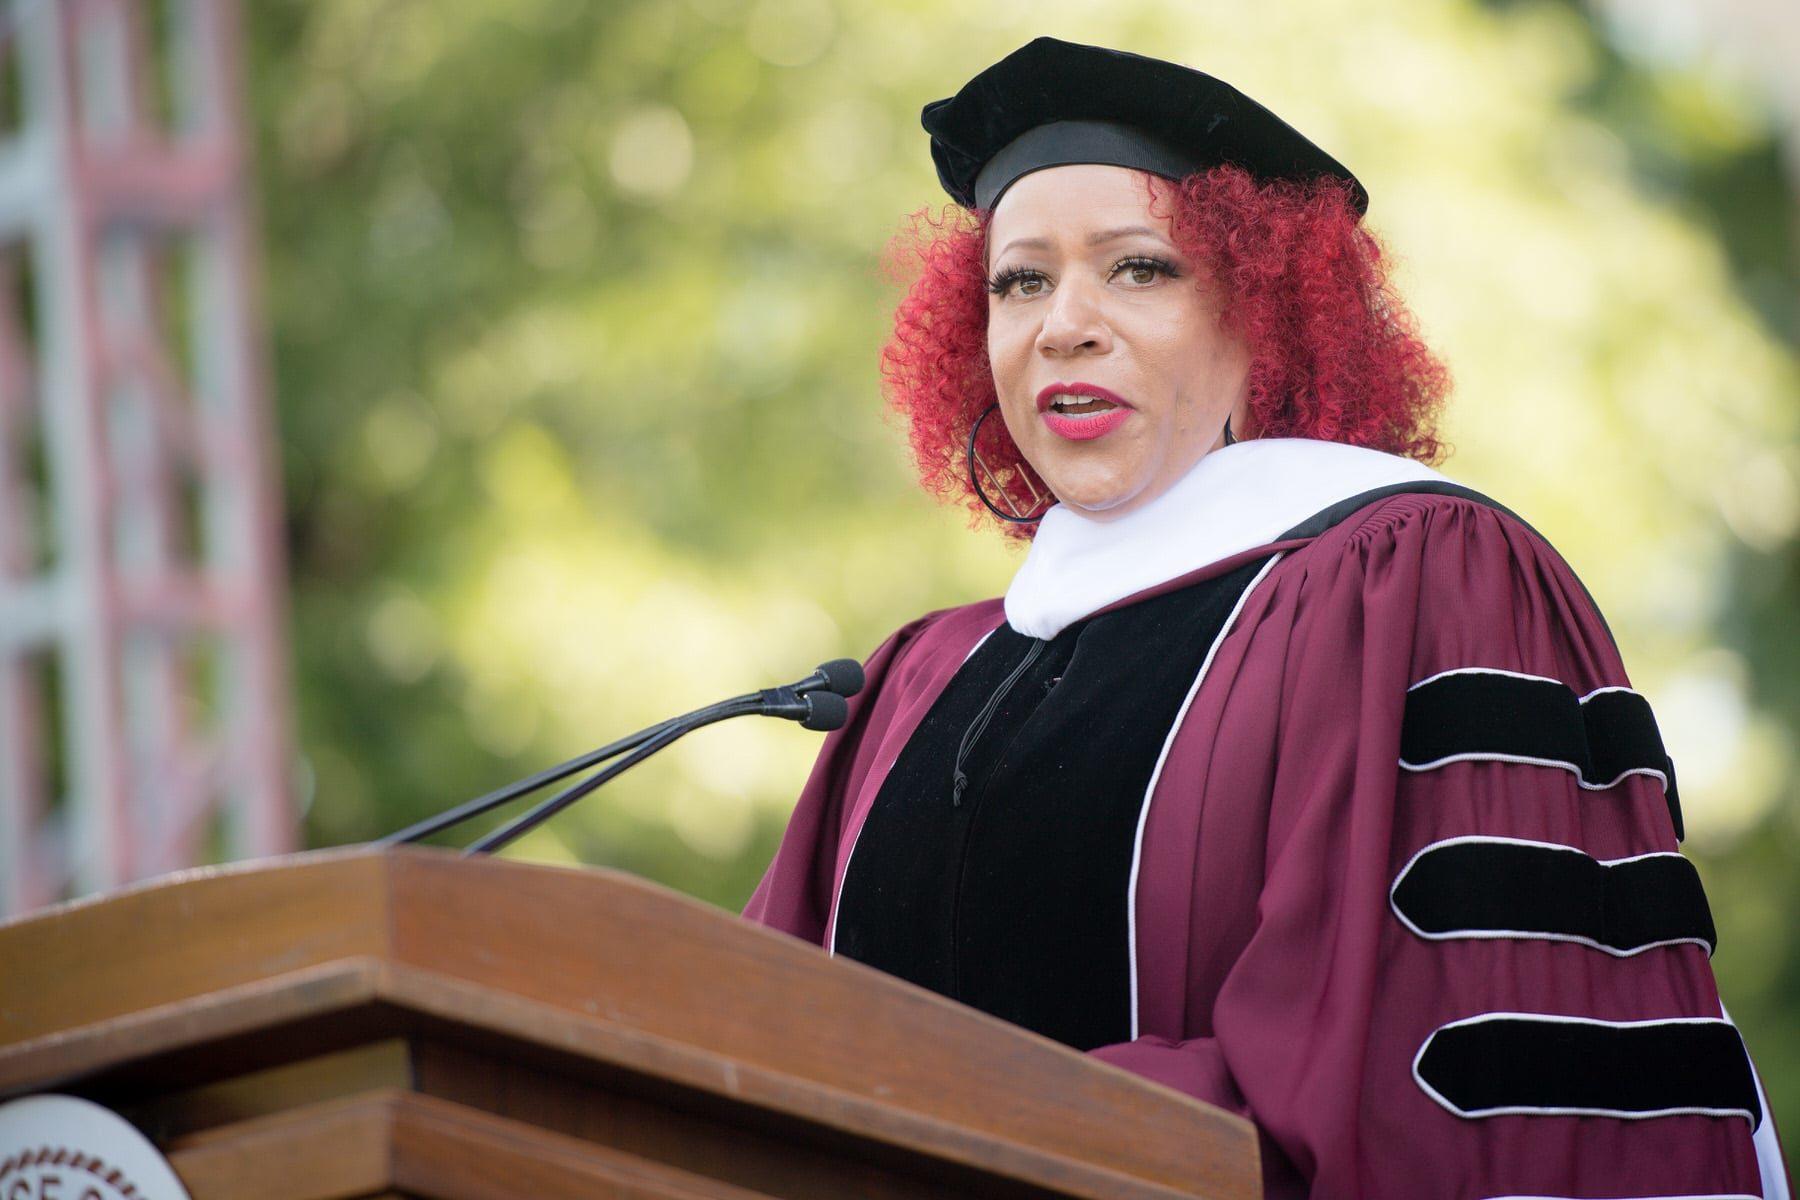 Nikole Hannah-Jones addressed graduates at Morehouse College on May 16, 2021